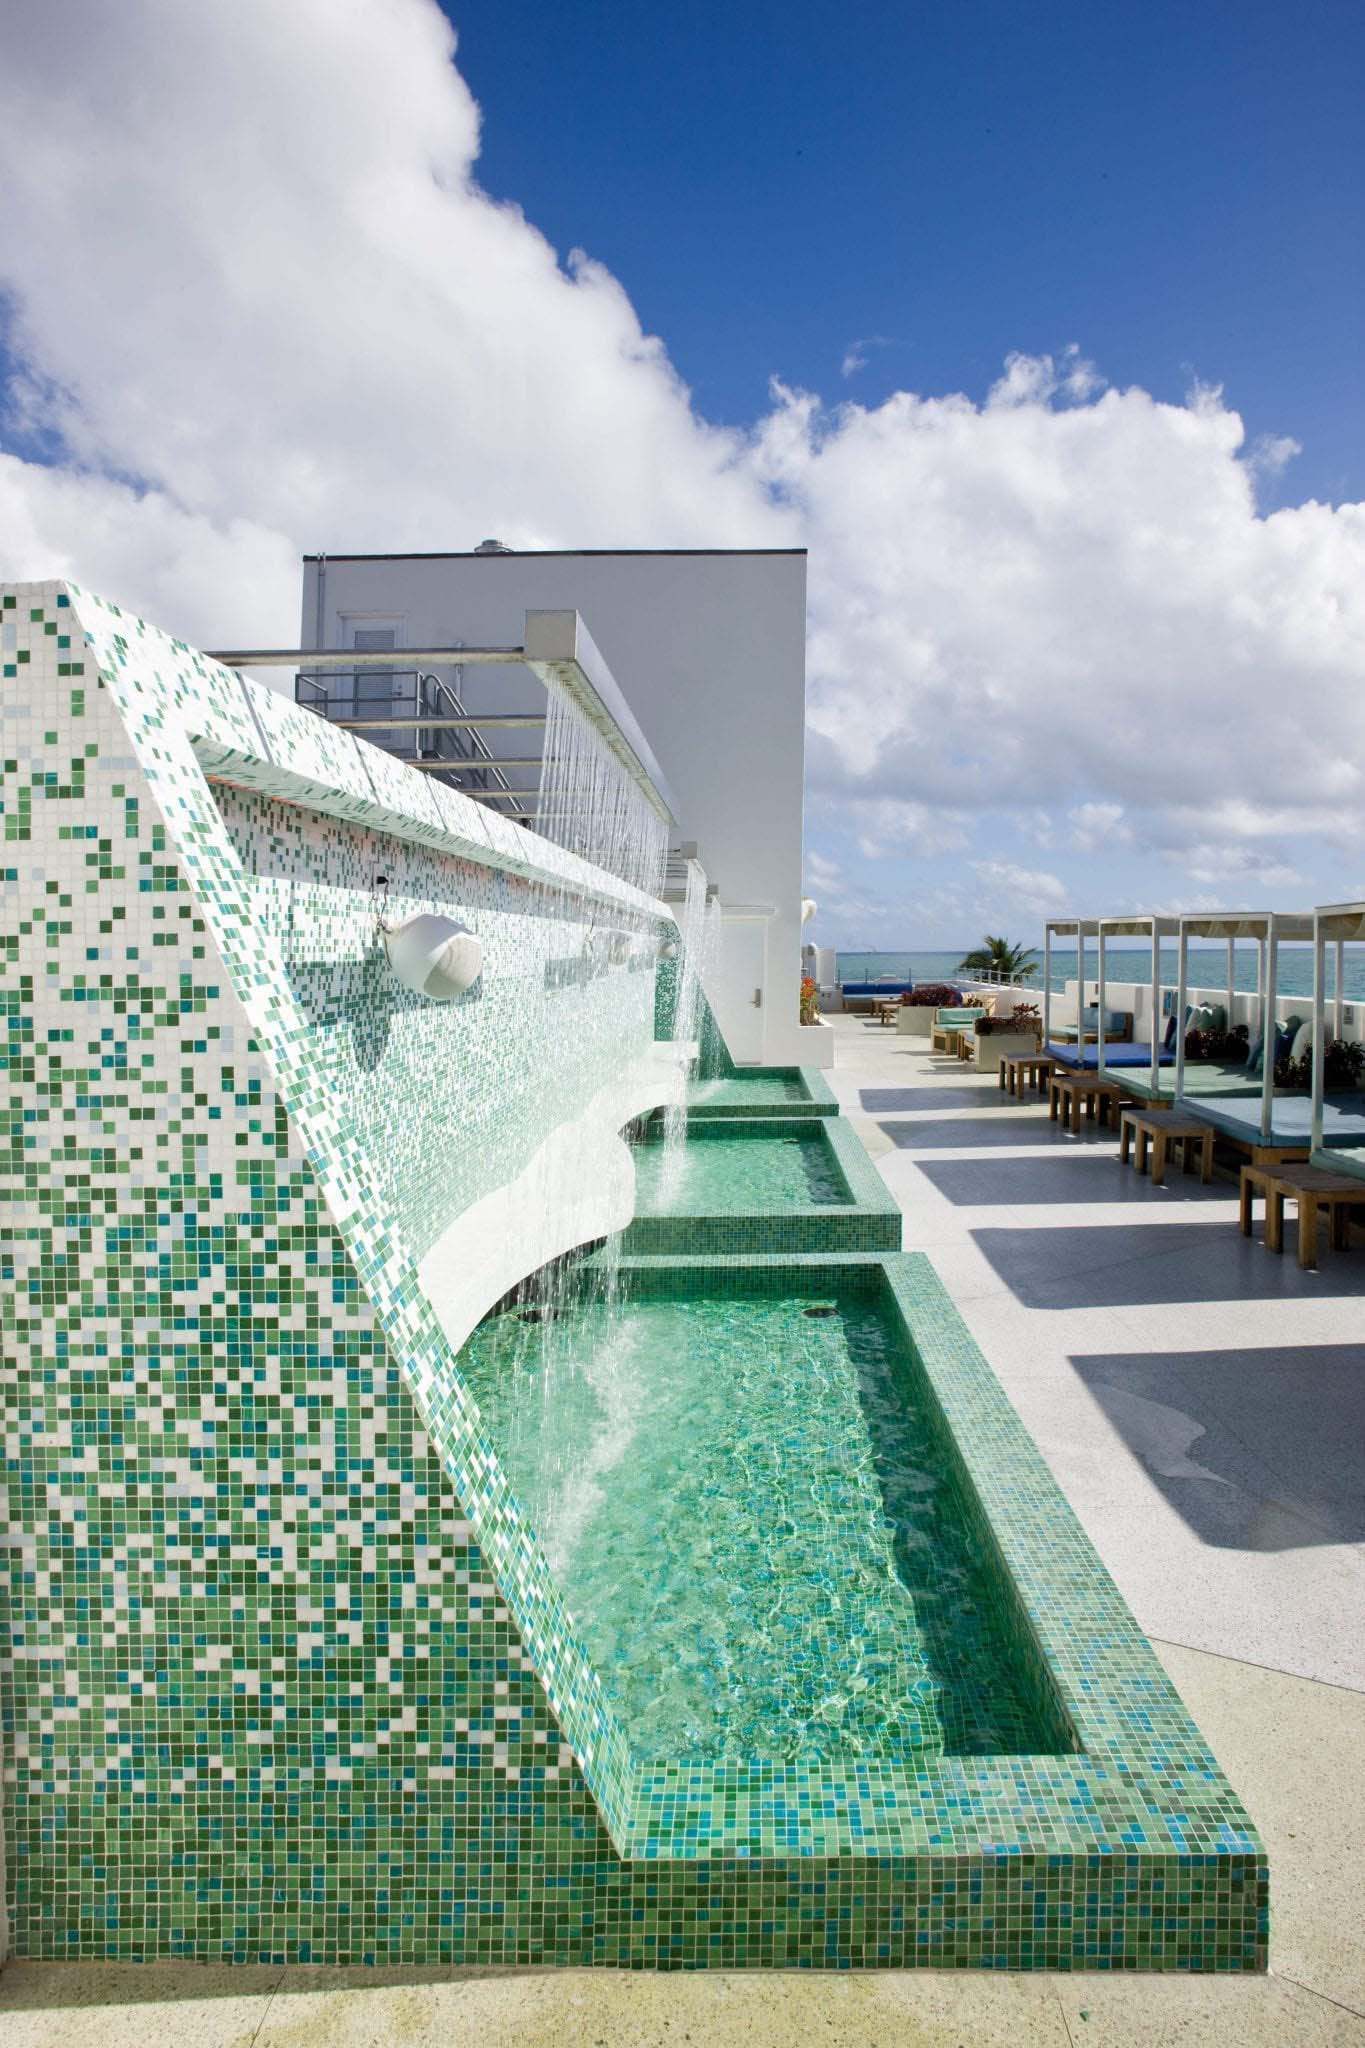 Clevelander South Beach Hotel, Miami Beach - FL Slideshow